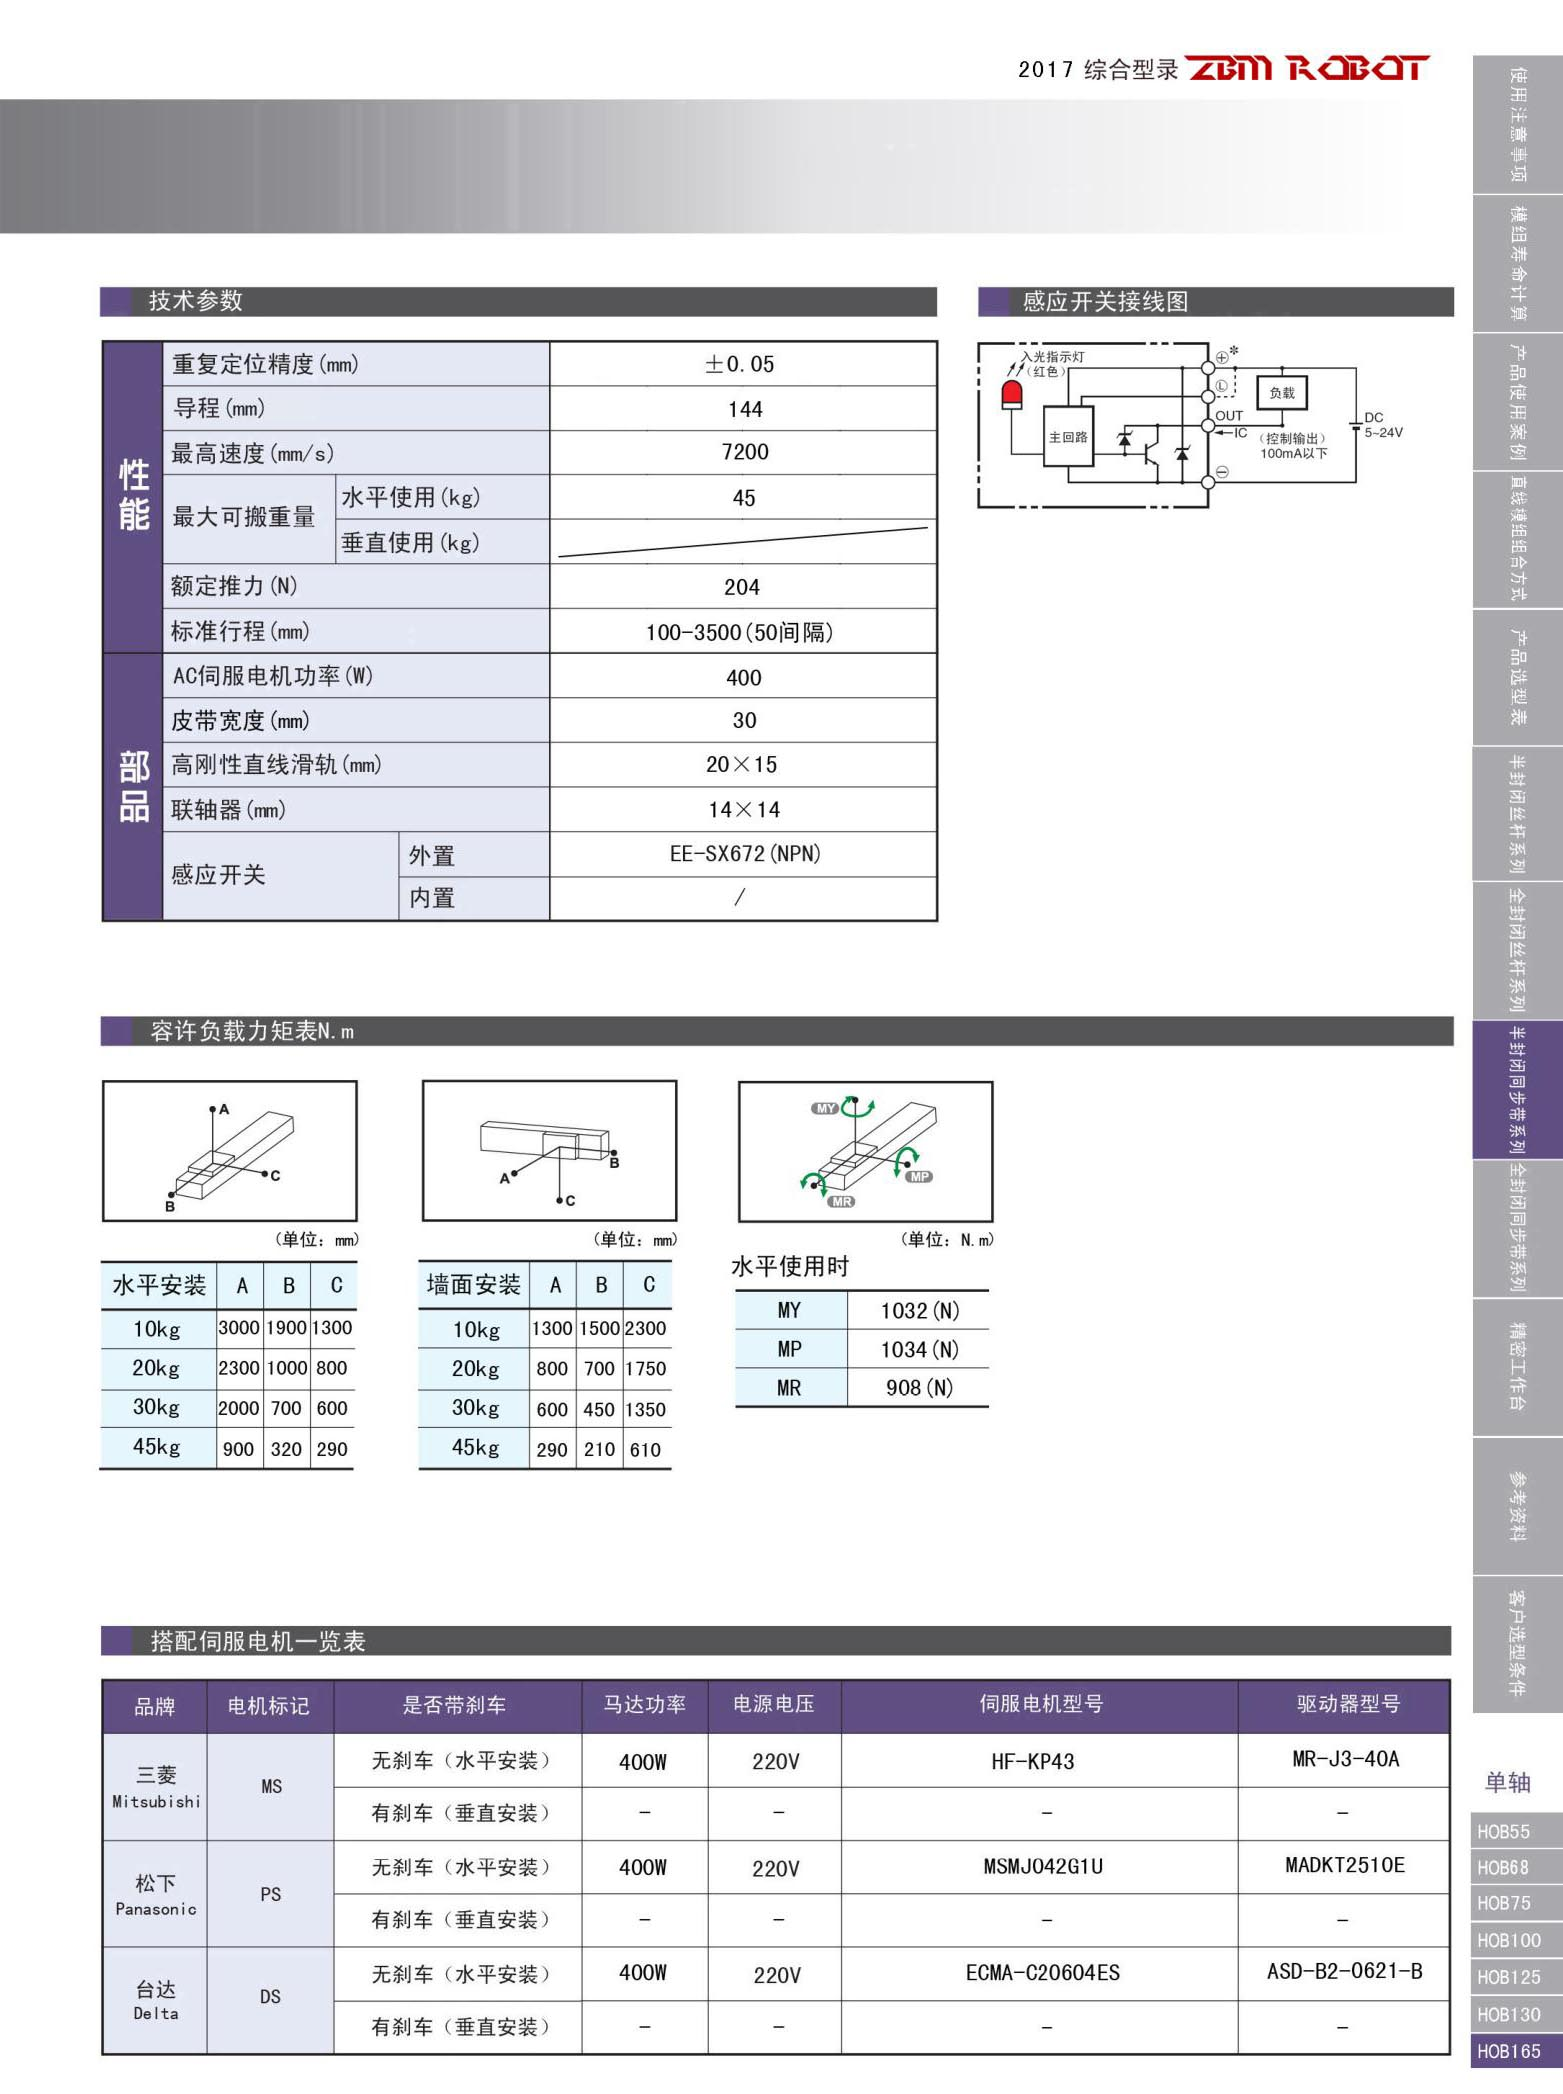 HOB165B-CM|半封闭皮带模组-深圳市桃花成视频人app智能装备有限公司